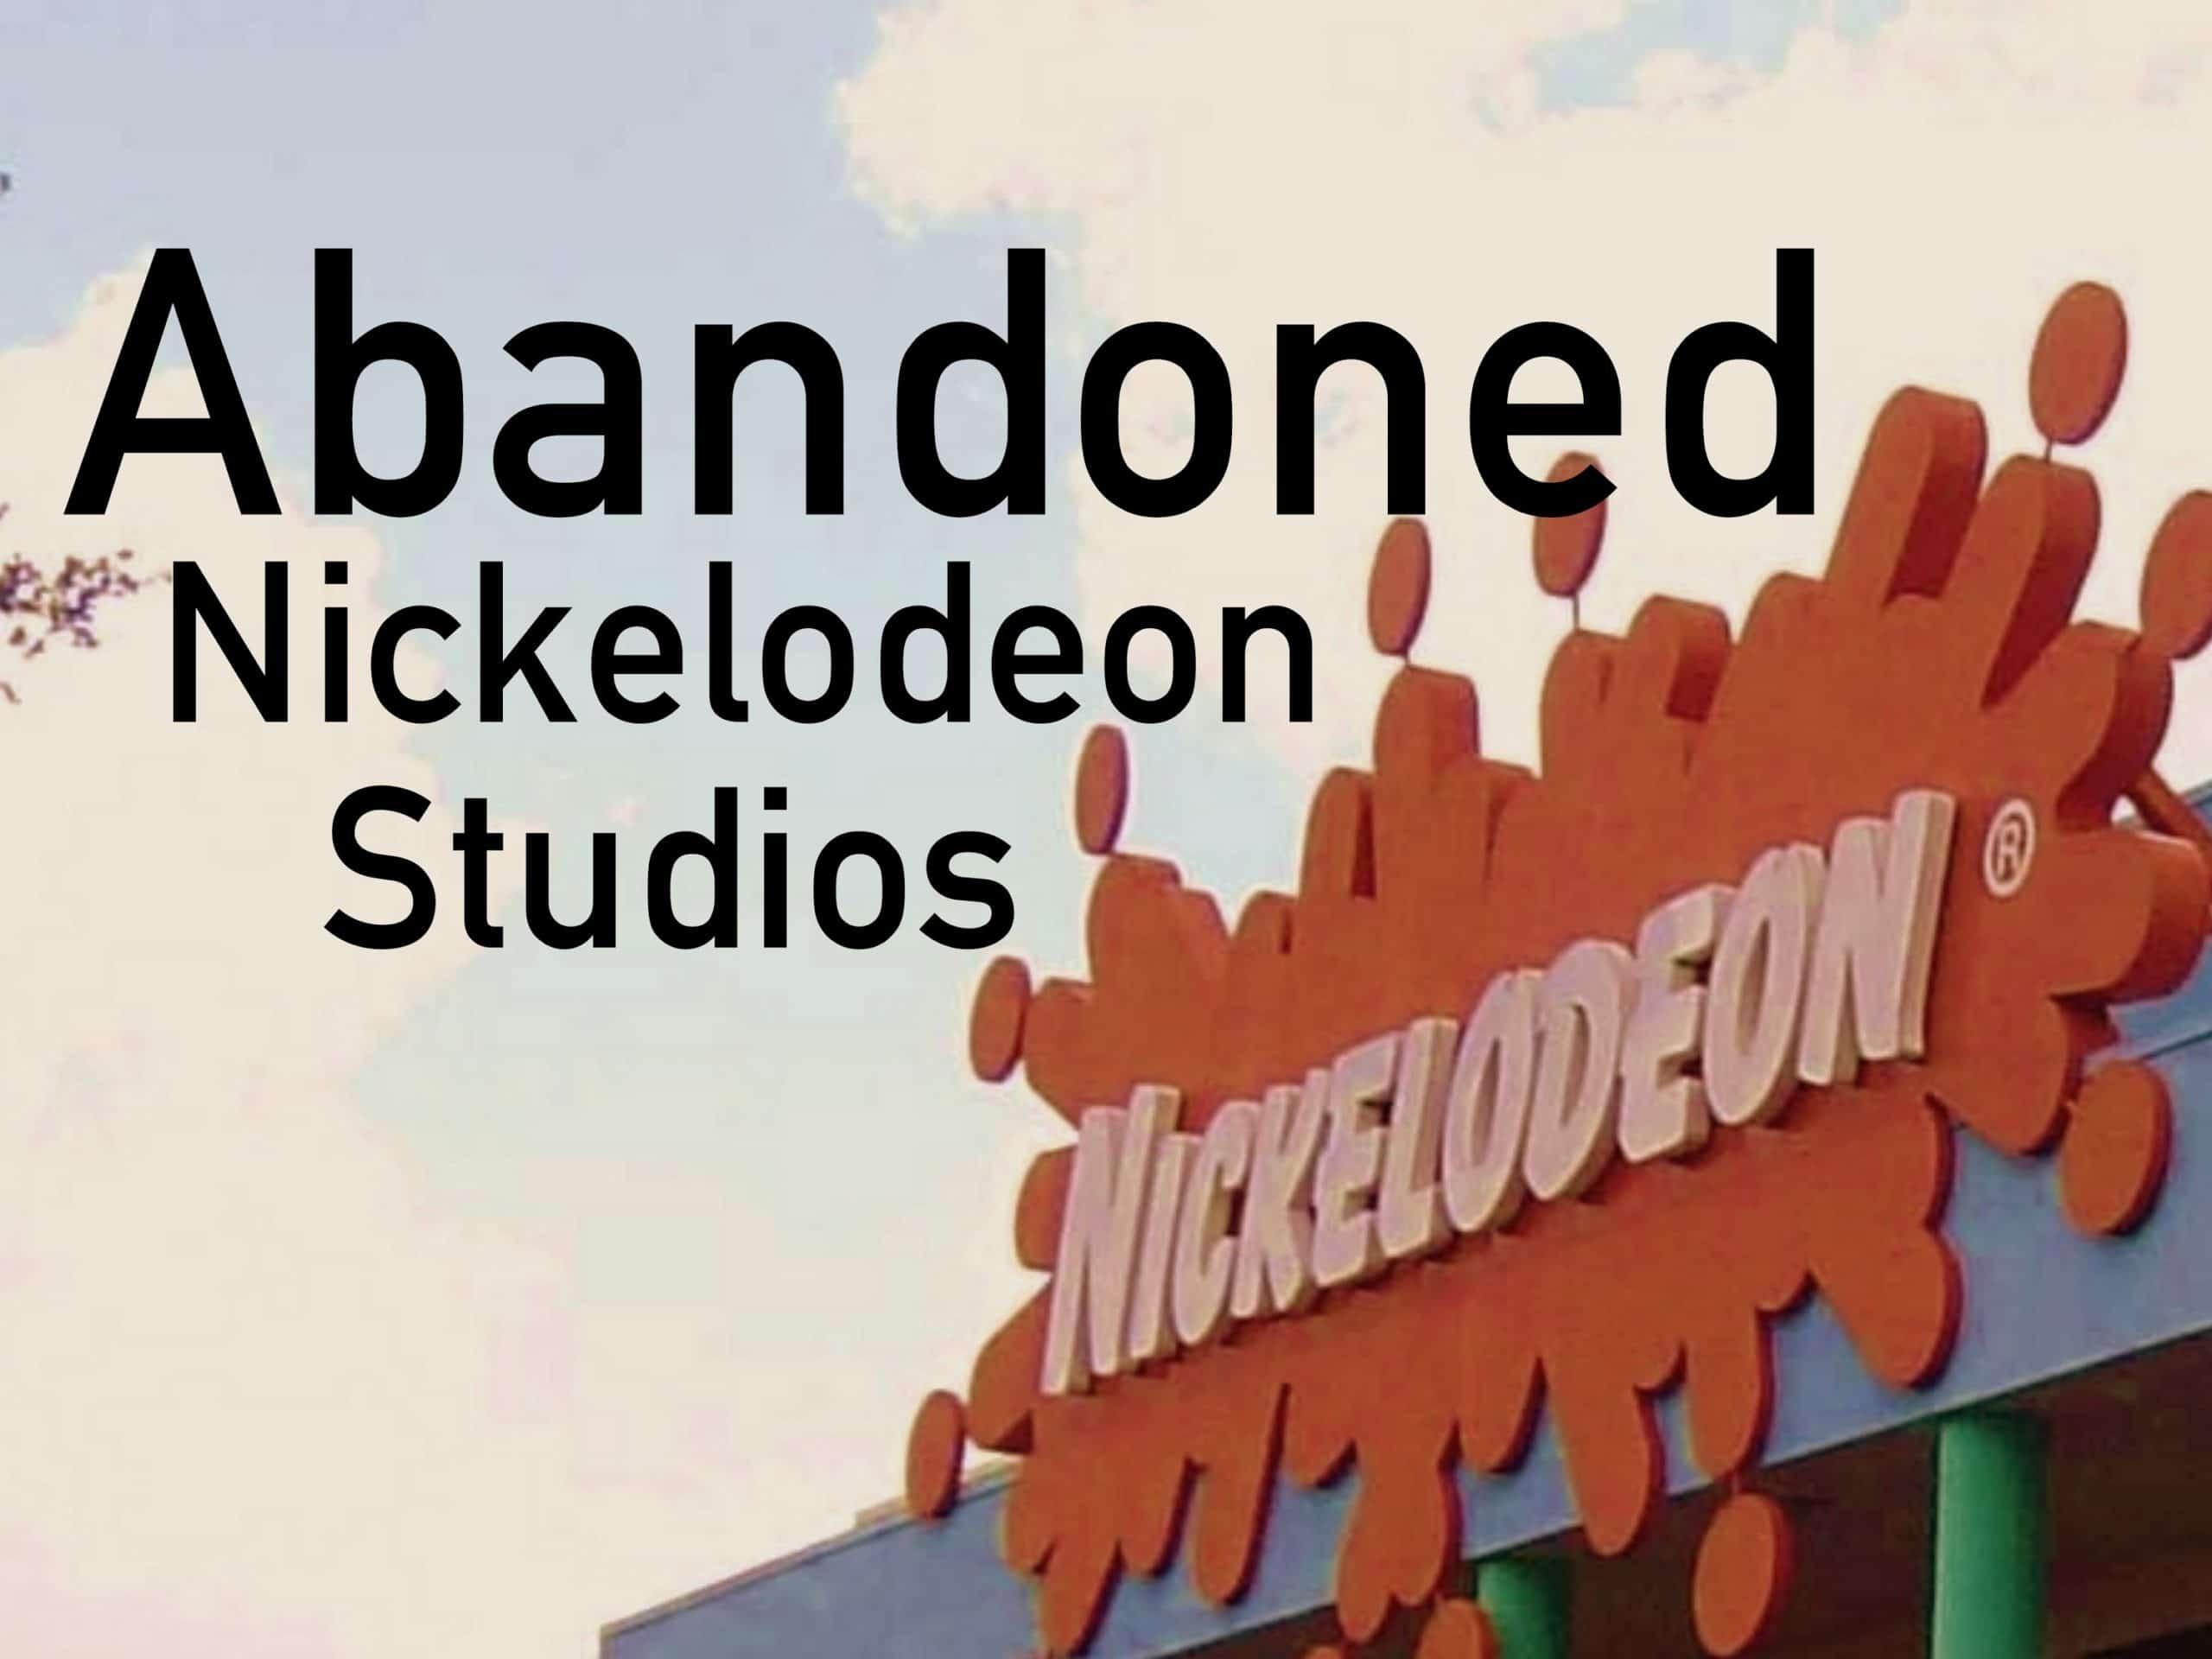 The Rack Up Abandoned Classic Nickelodeon Studios